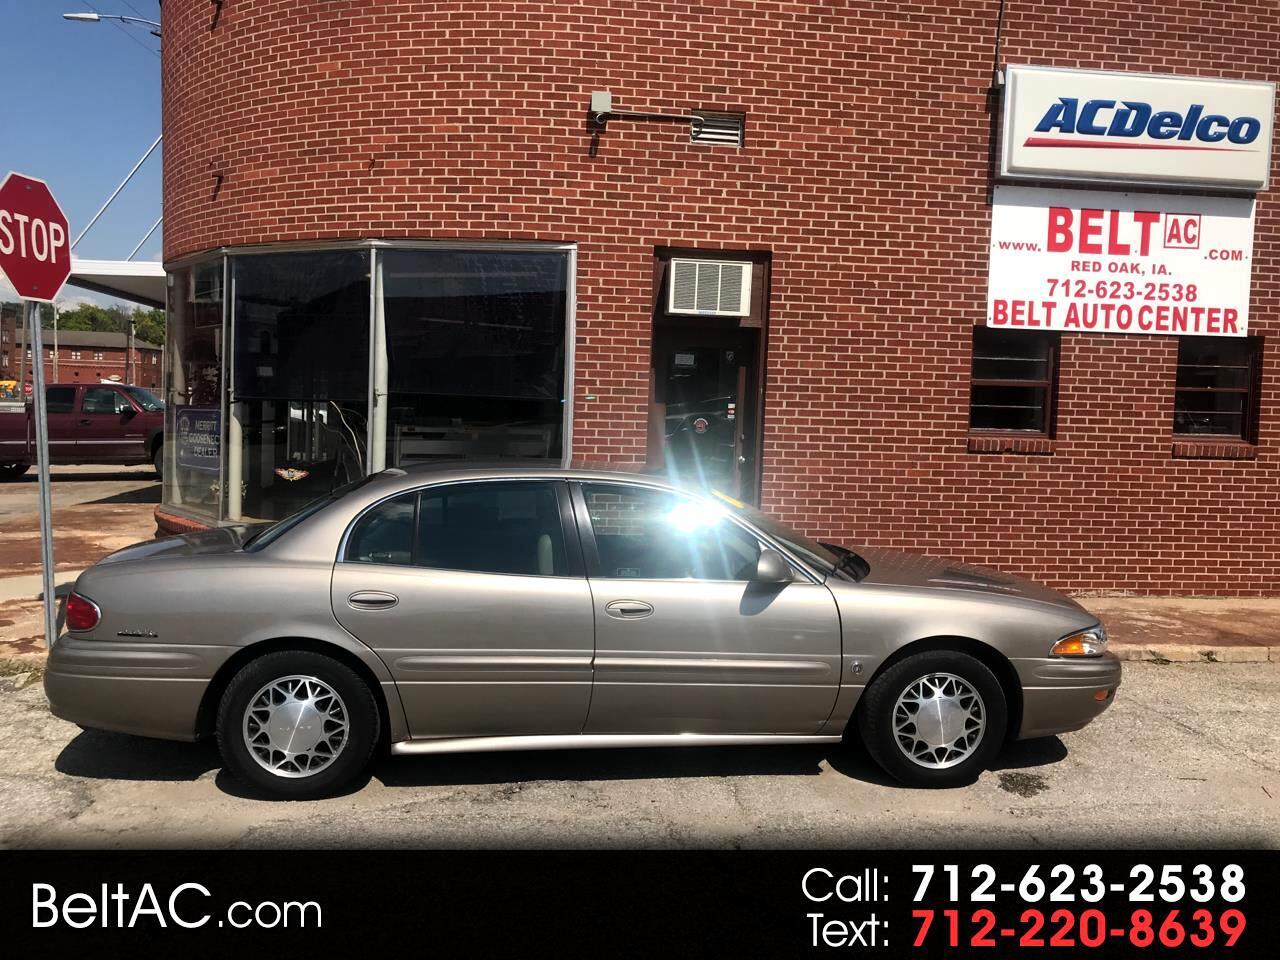 Buick LeSabre 4dr Sdn Custom 2002